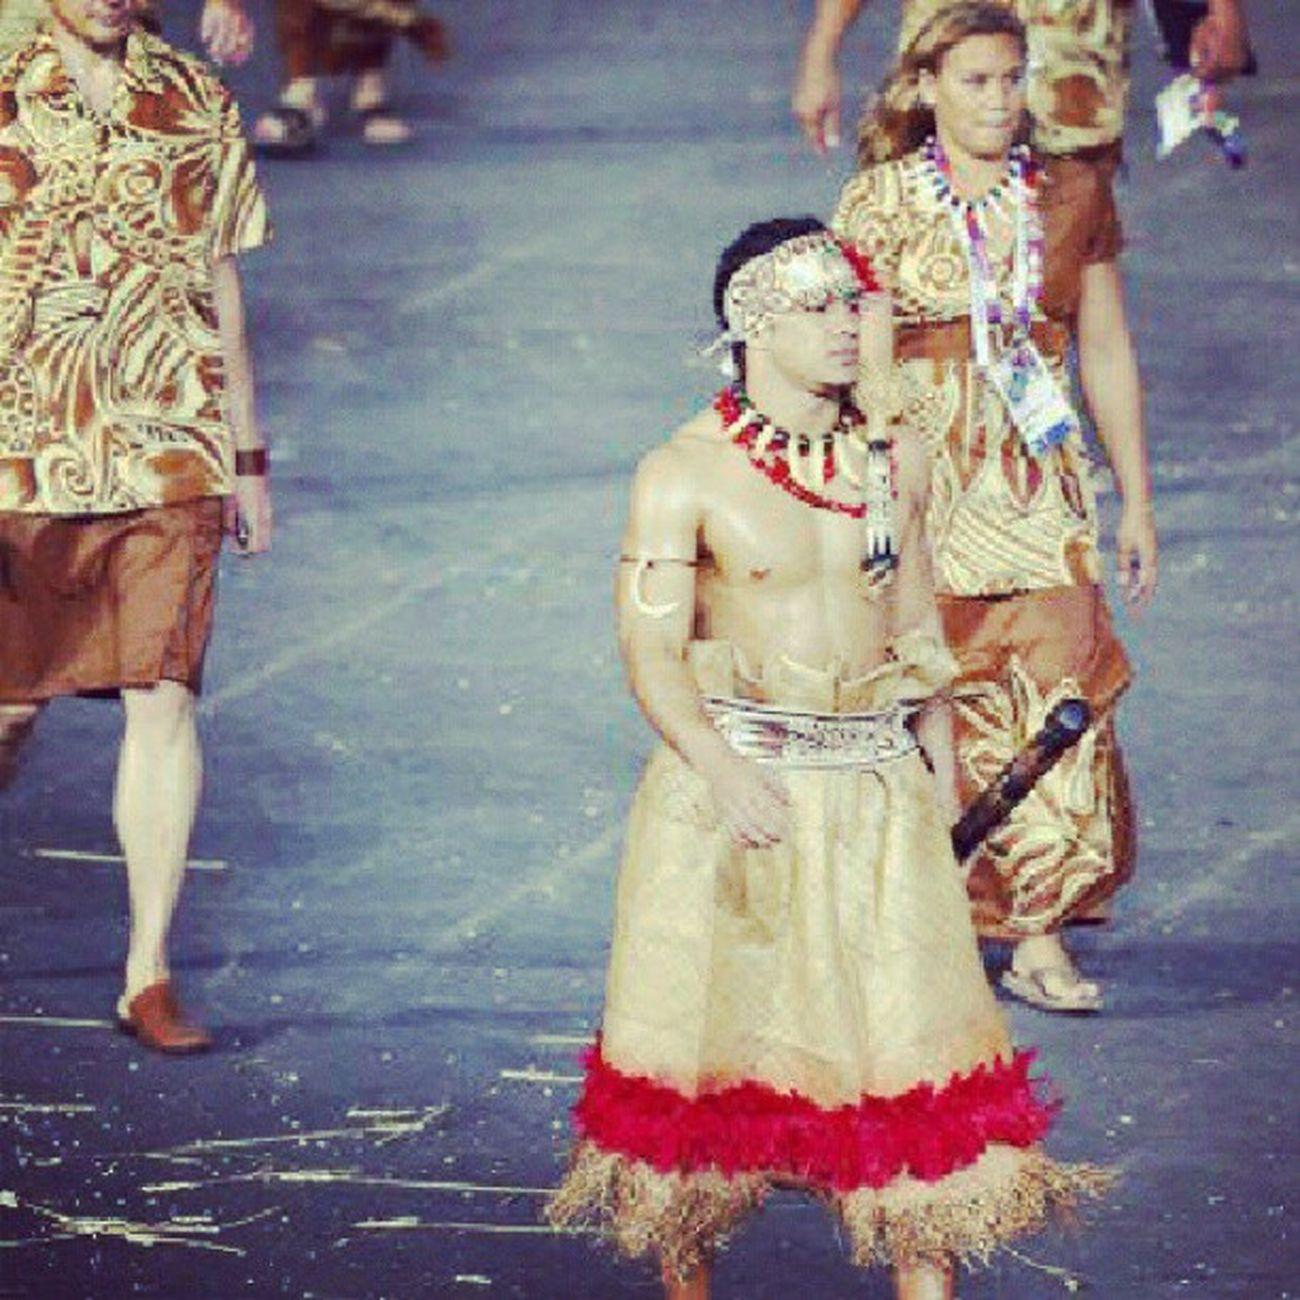 TEAM SAMOA REPRESENT... TeamSamoa LondomOlympics2012 PolynesianPride